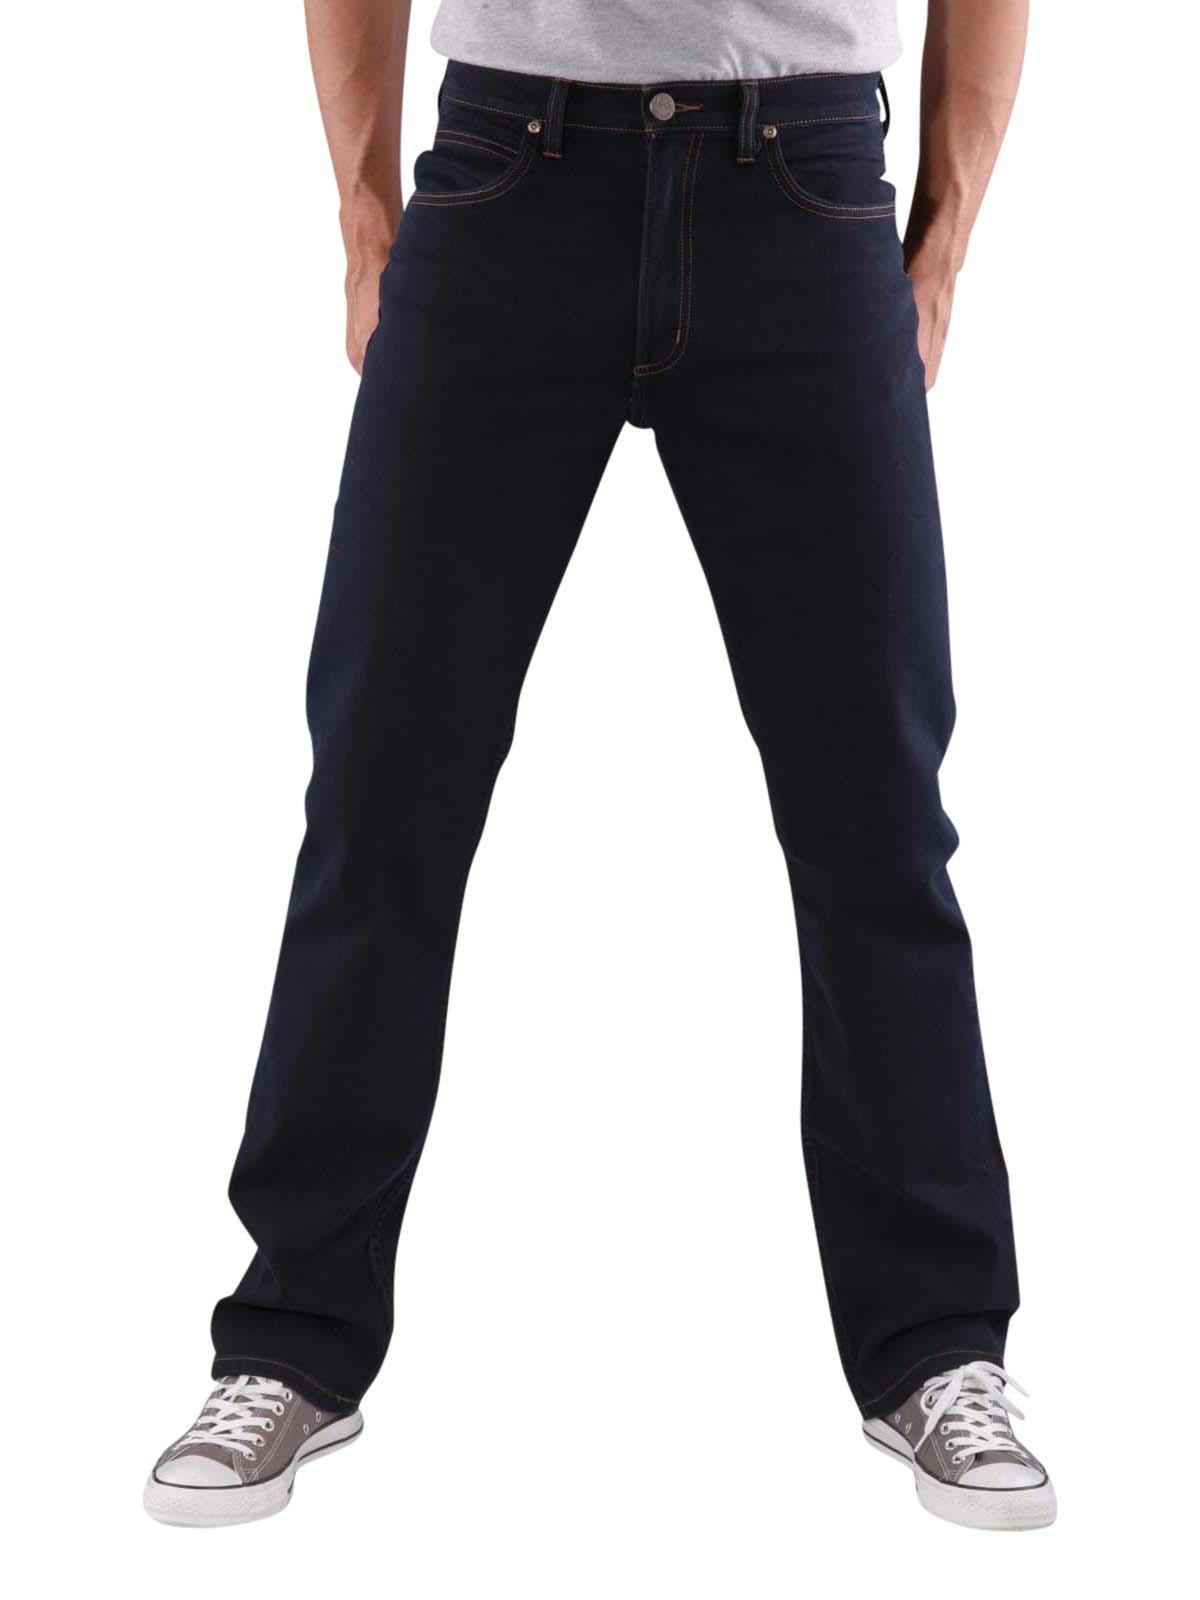 Lee Brooklyn New Men/'s Stretch Jeans Straight Leg Side Light Blue Denim